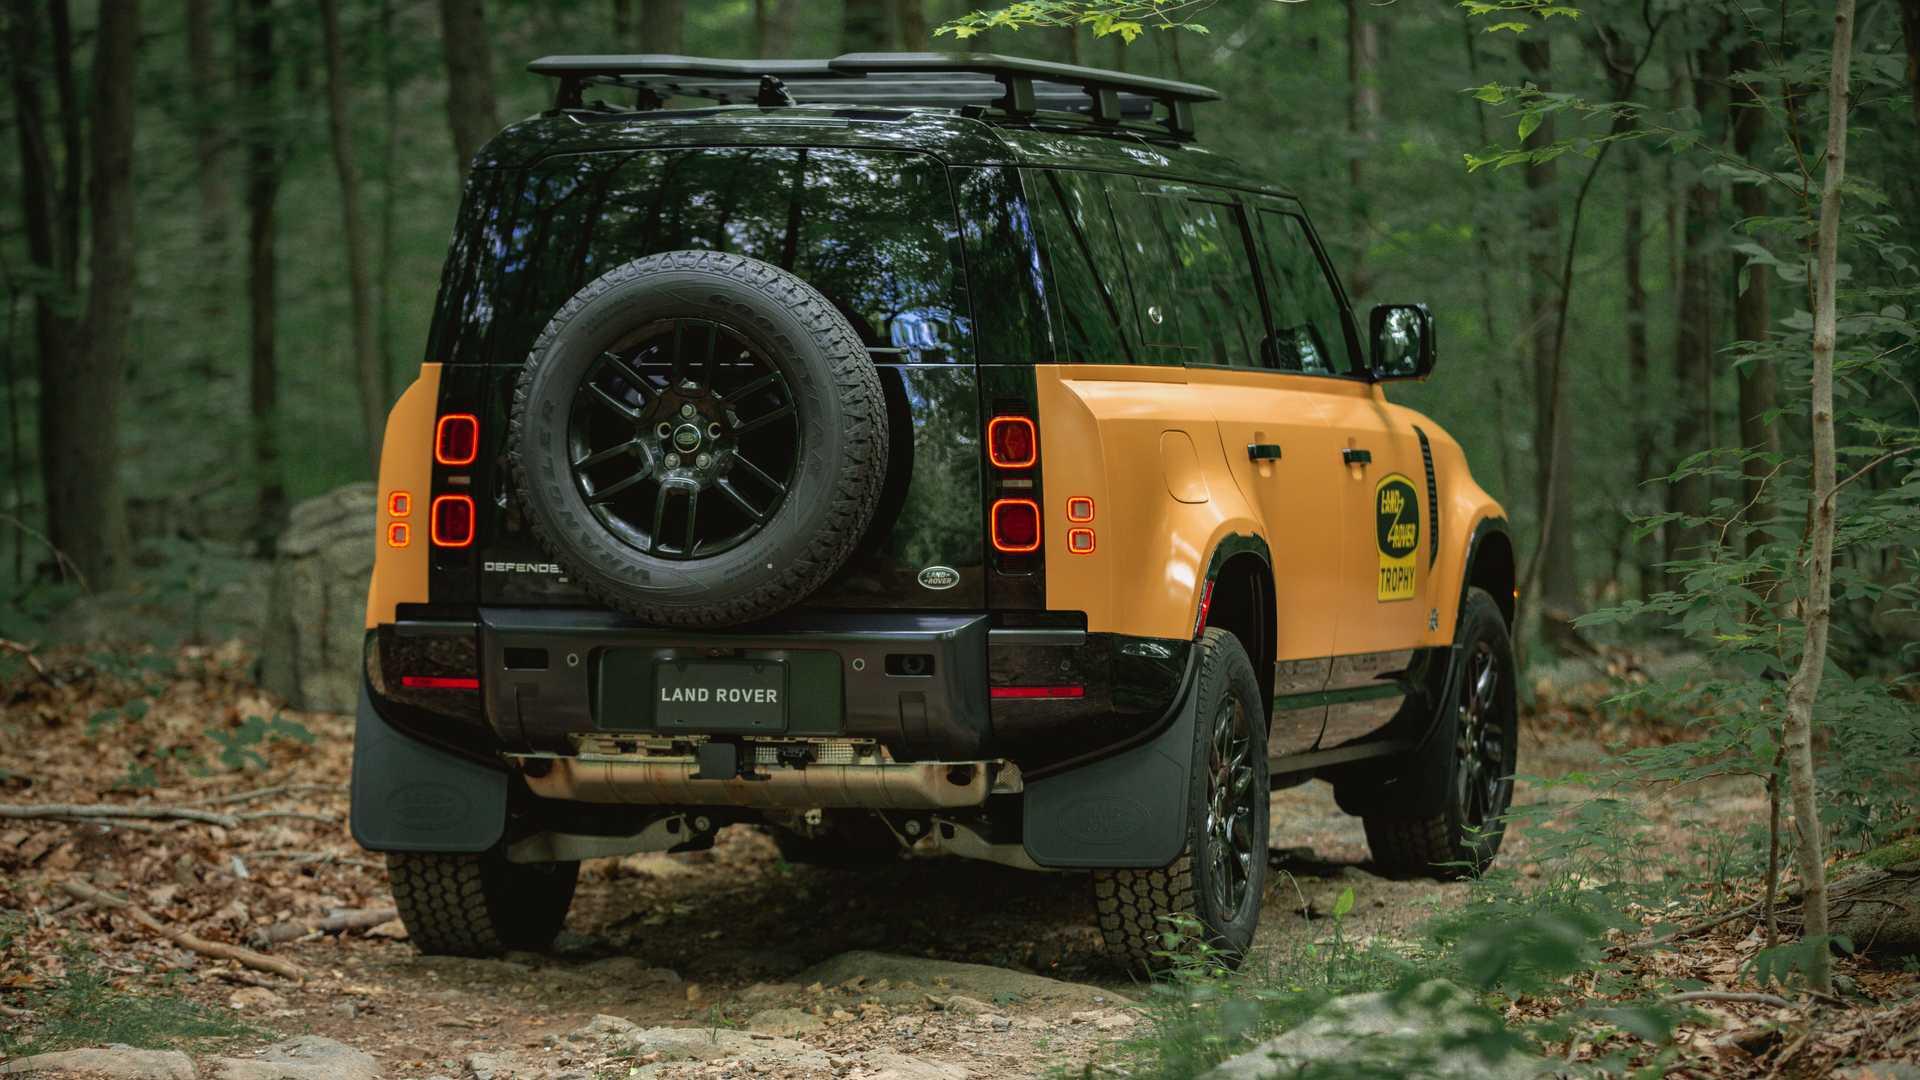 Land-Rover-Defender-Trophy-Edition-7